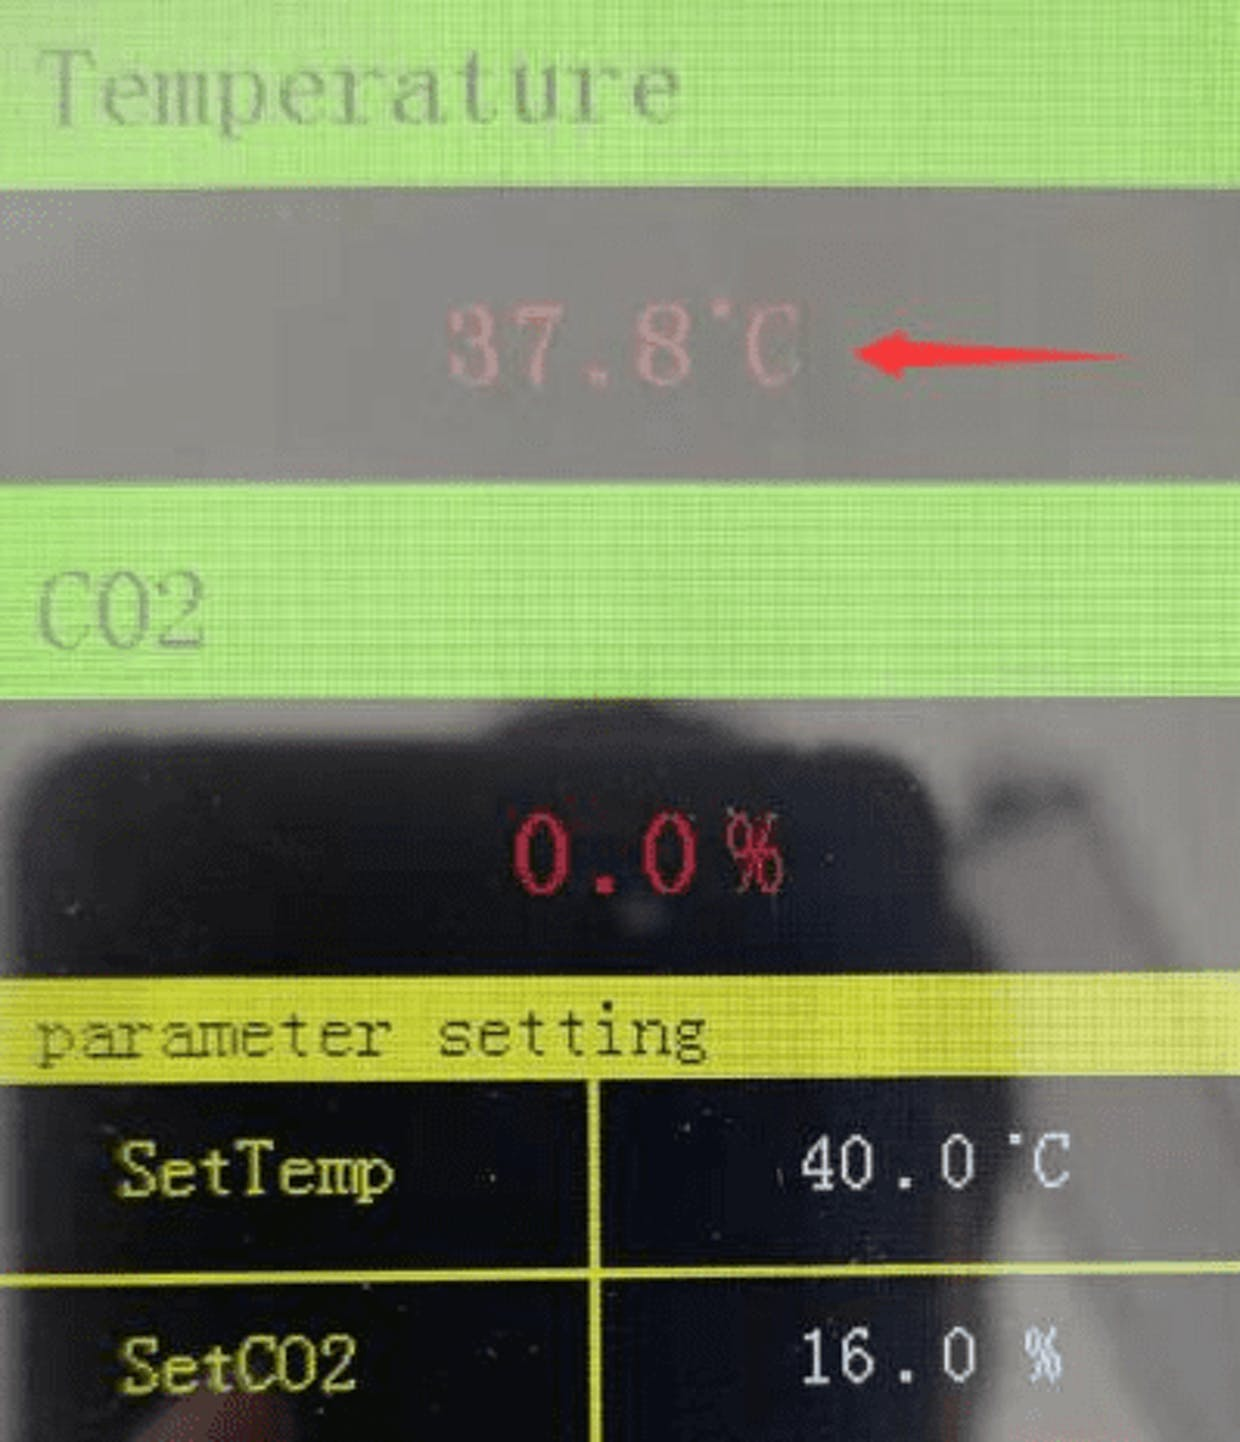 When updating temperature data, display flicker